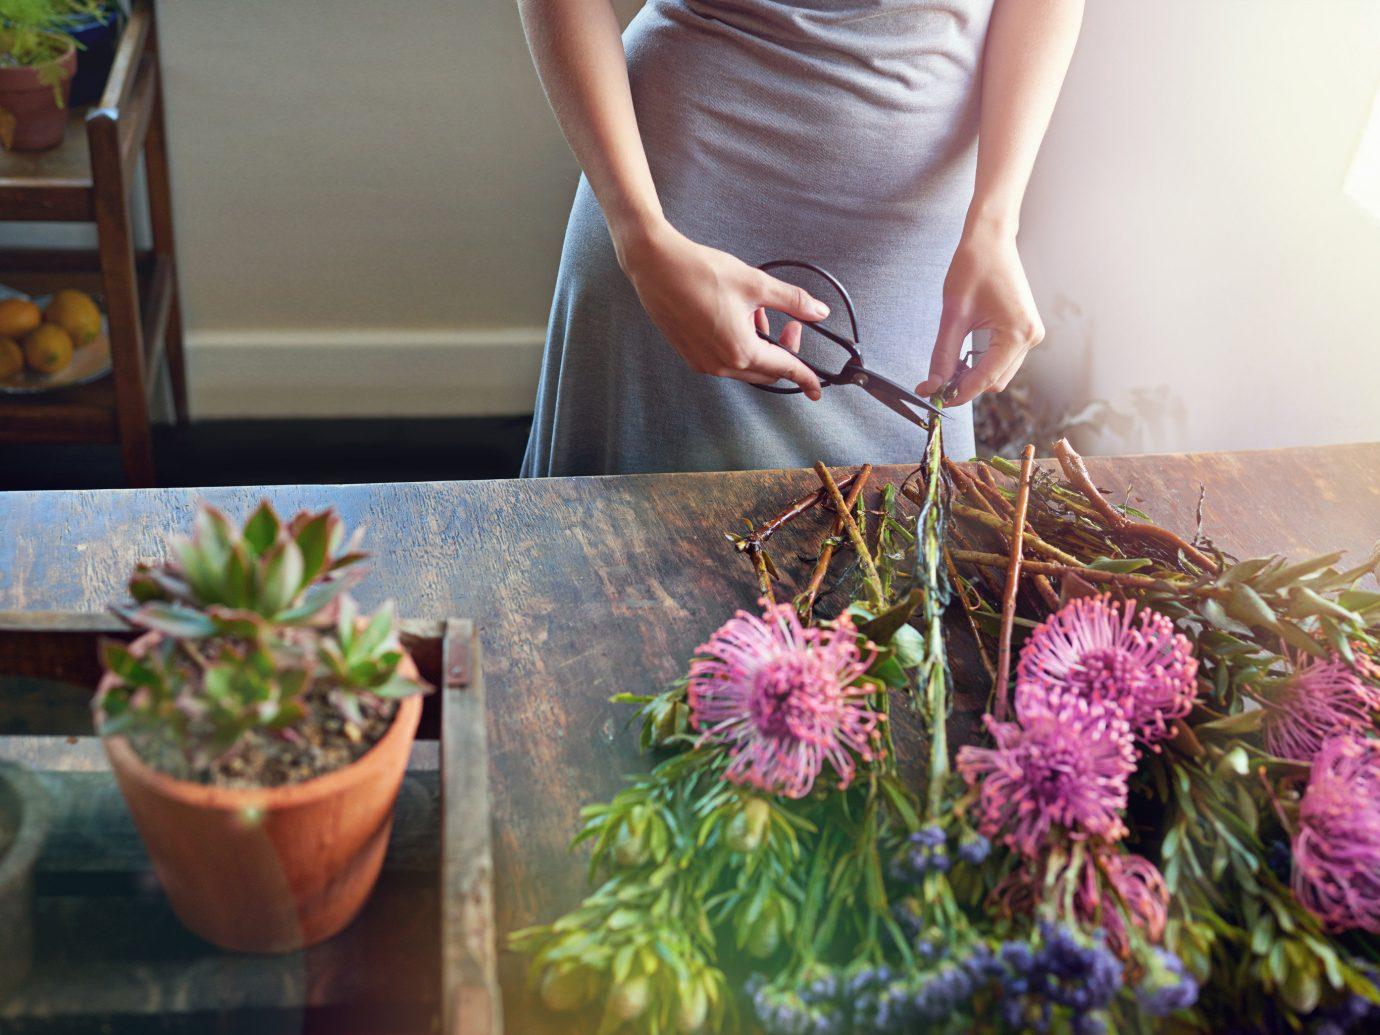 Offbeat person flower arranging woman plant floristry flower botany floral design land plant Garden flowering plant